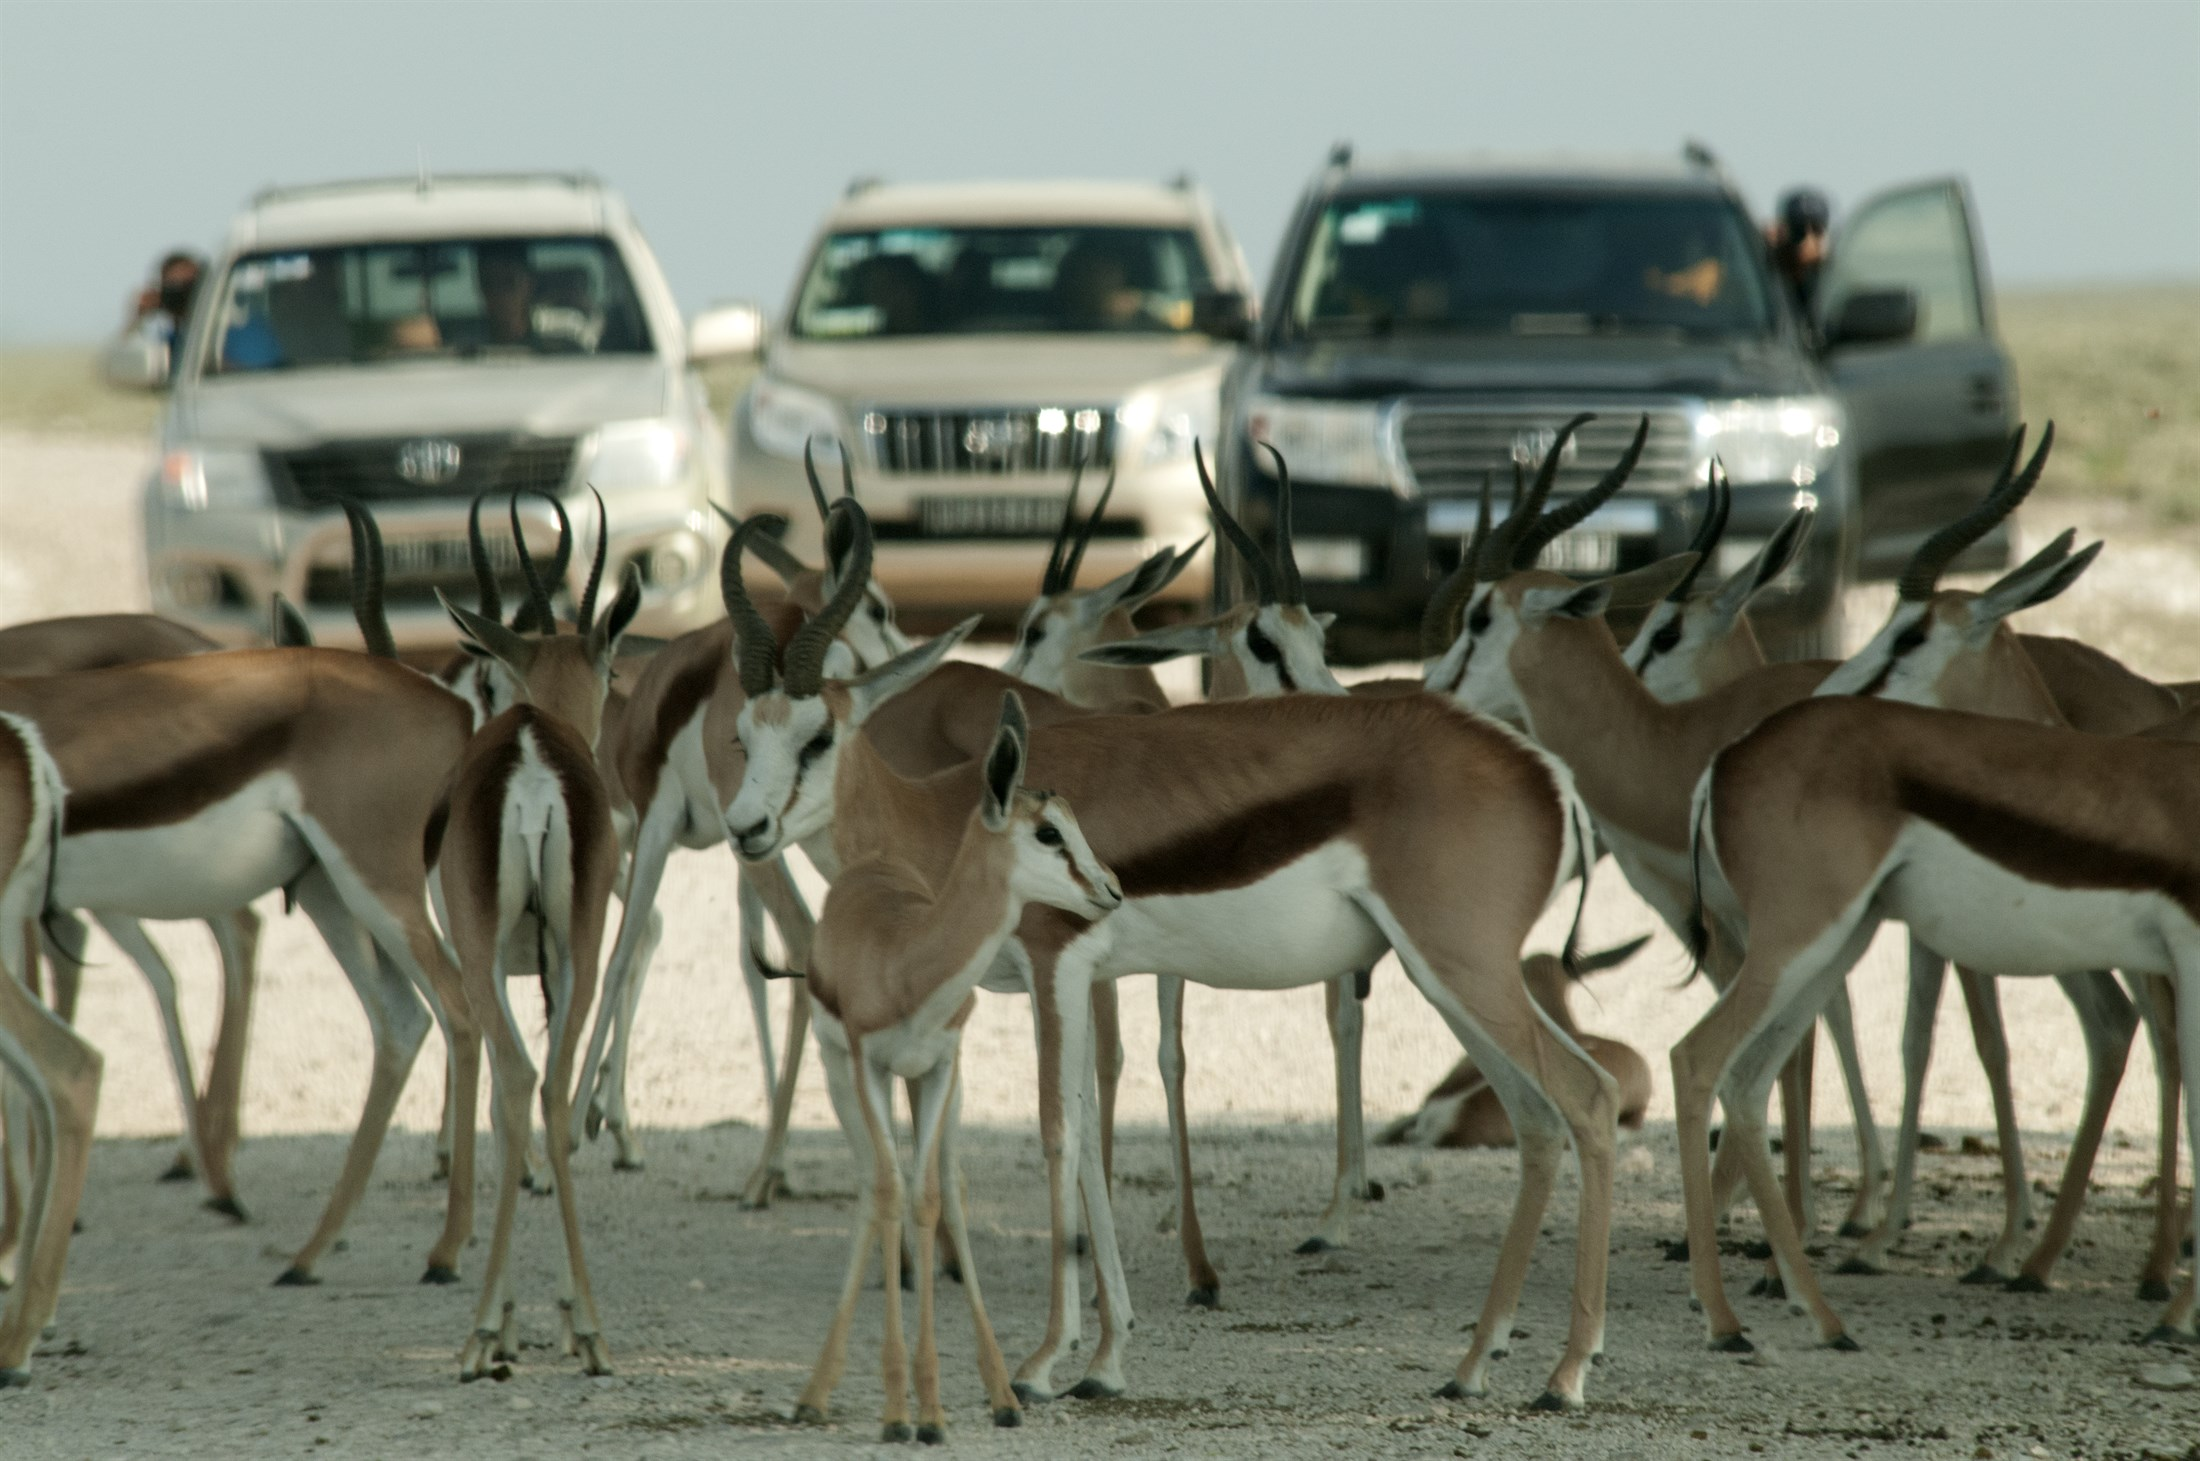 springboks-antidorcas-marsupialis-blocking-the-road-in-etoscha-national-park-namibia_8ce3-2200x1461px